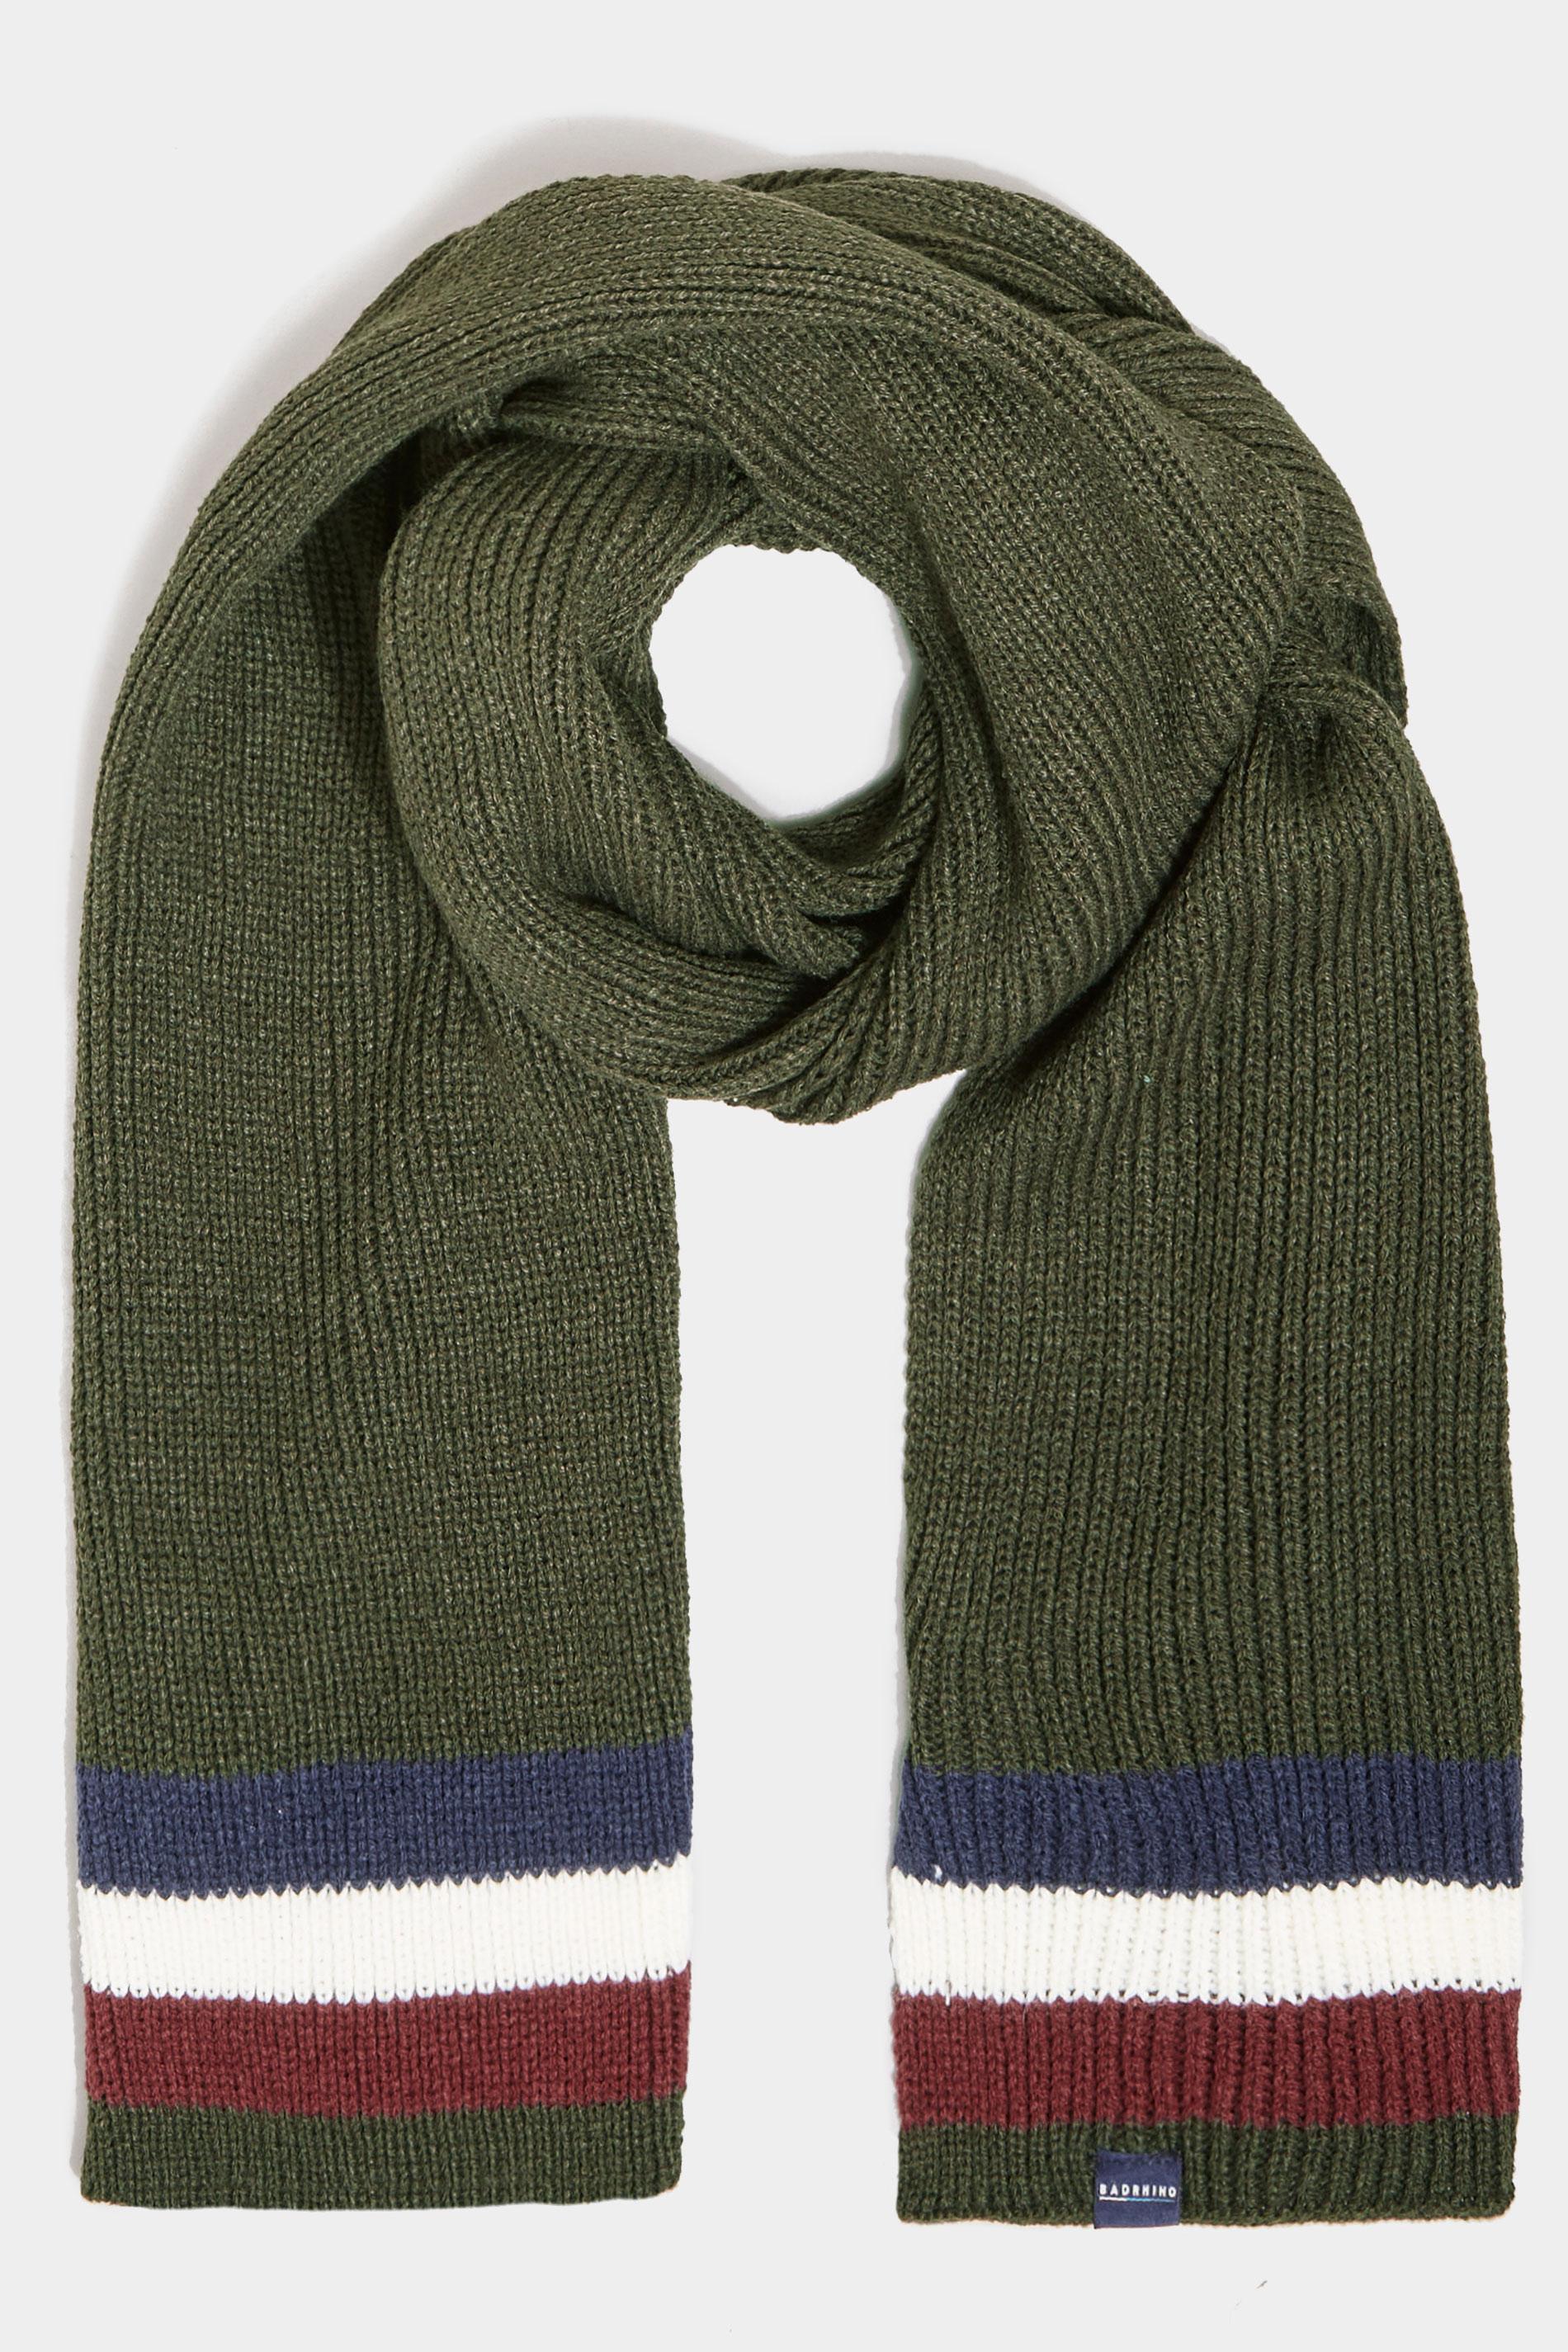 BadRhino Khaki Colour Block Knitted Scarf